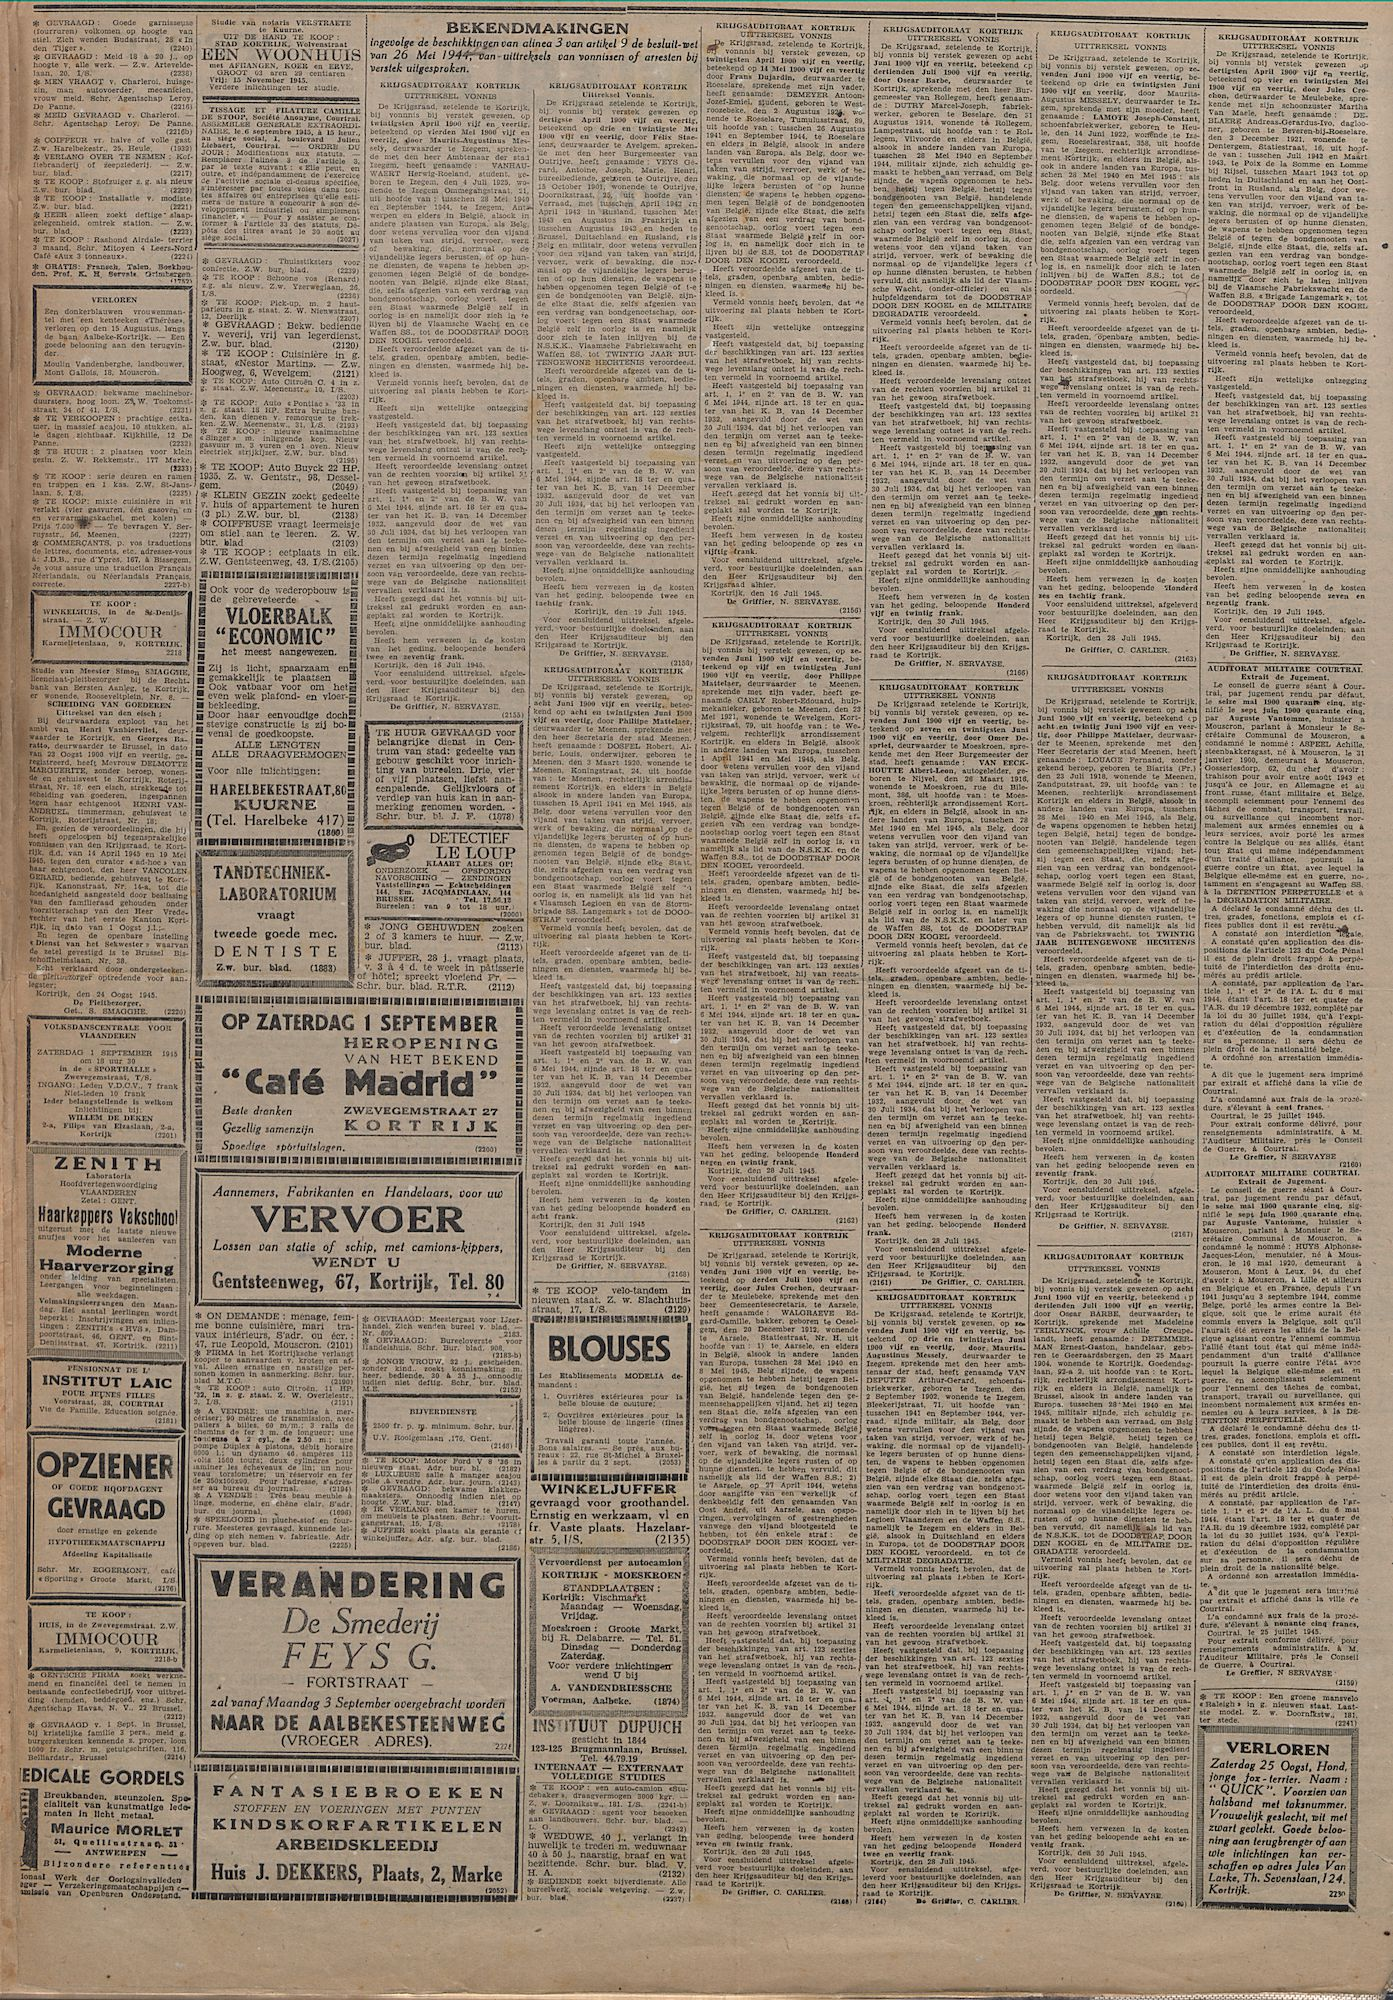 Kortrijksch Handelsblad 29 augustus 1945 Nr69 p2